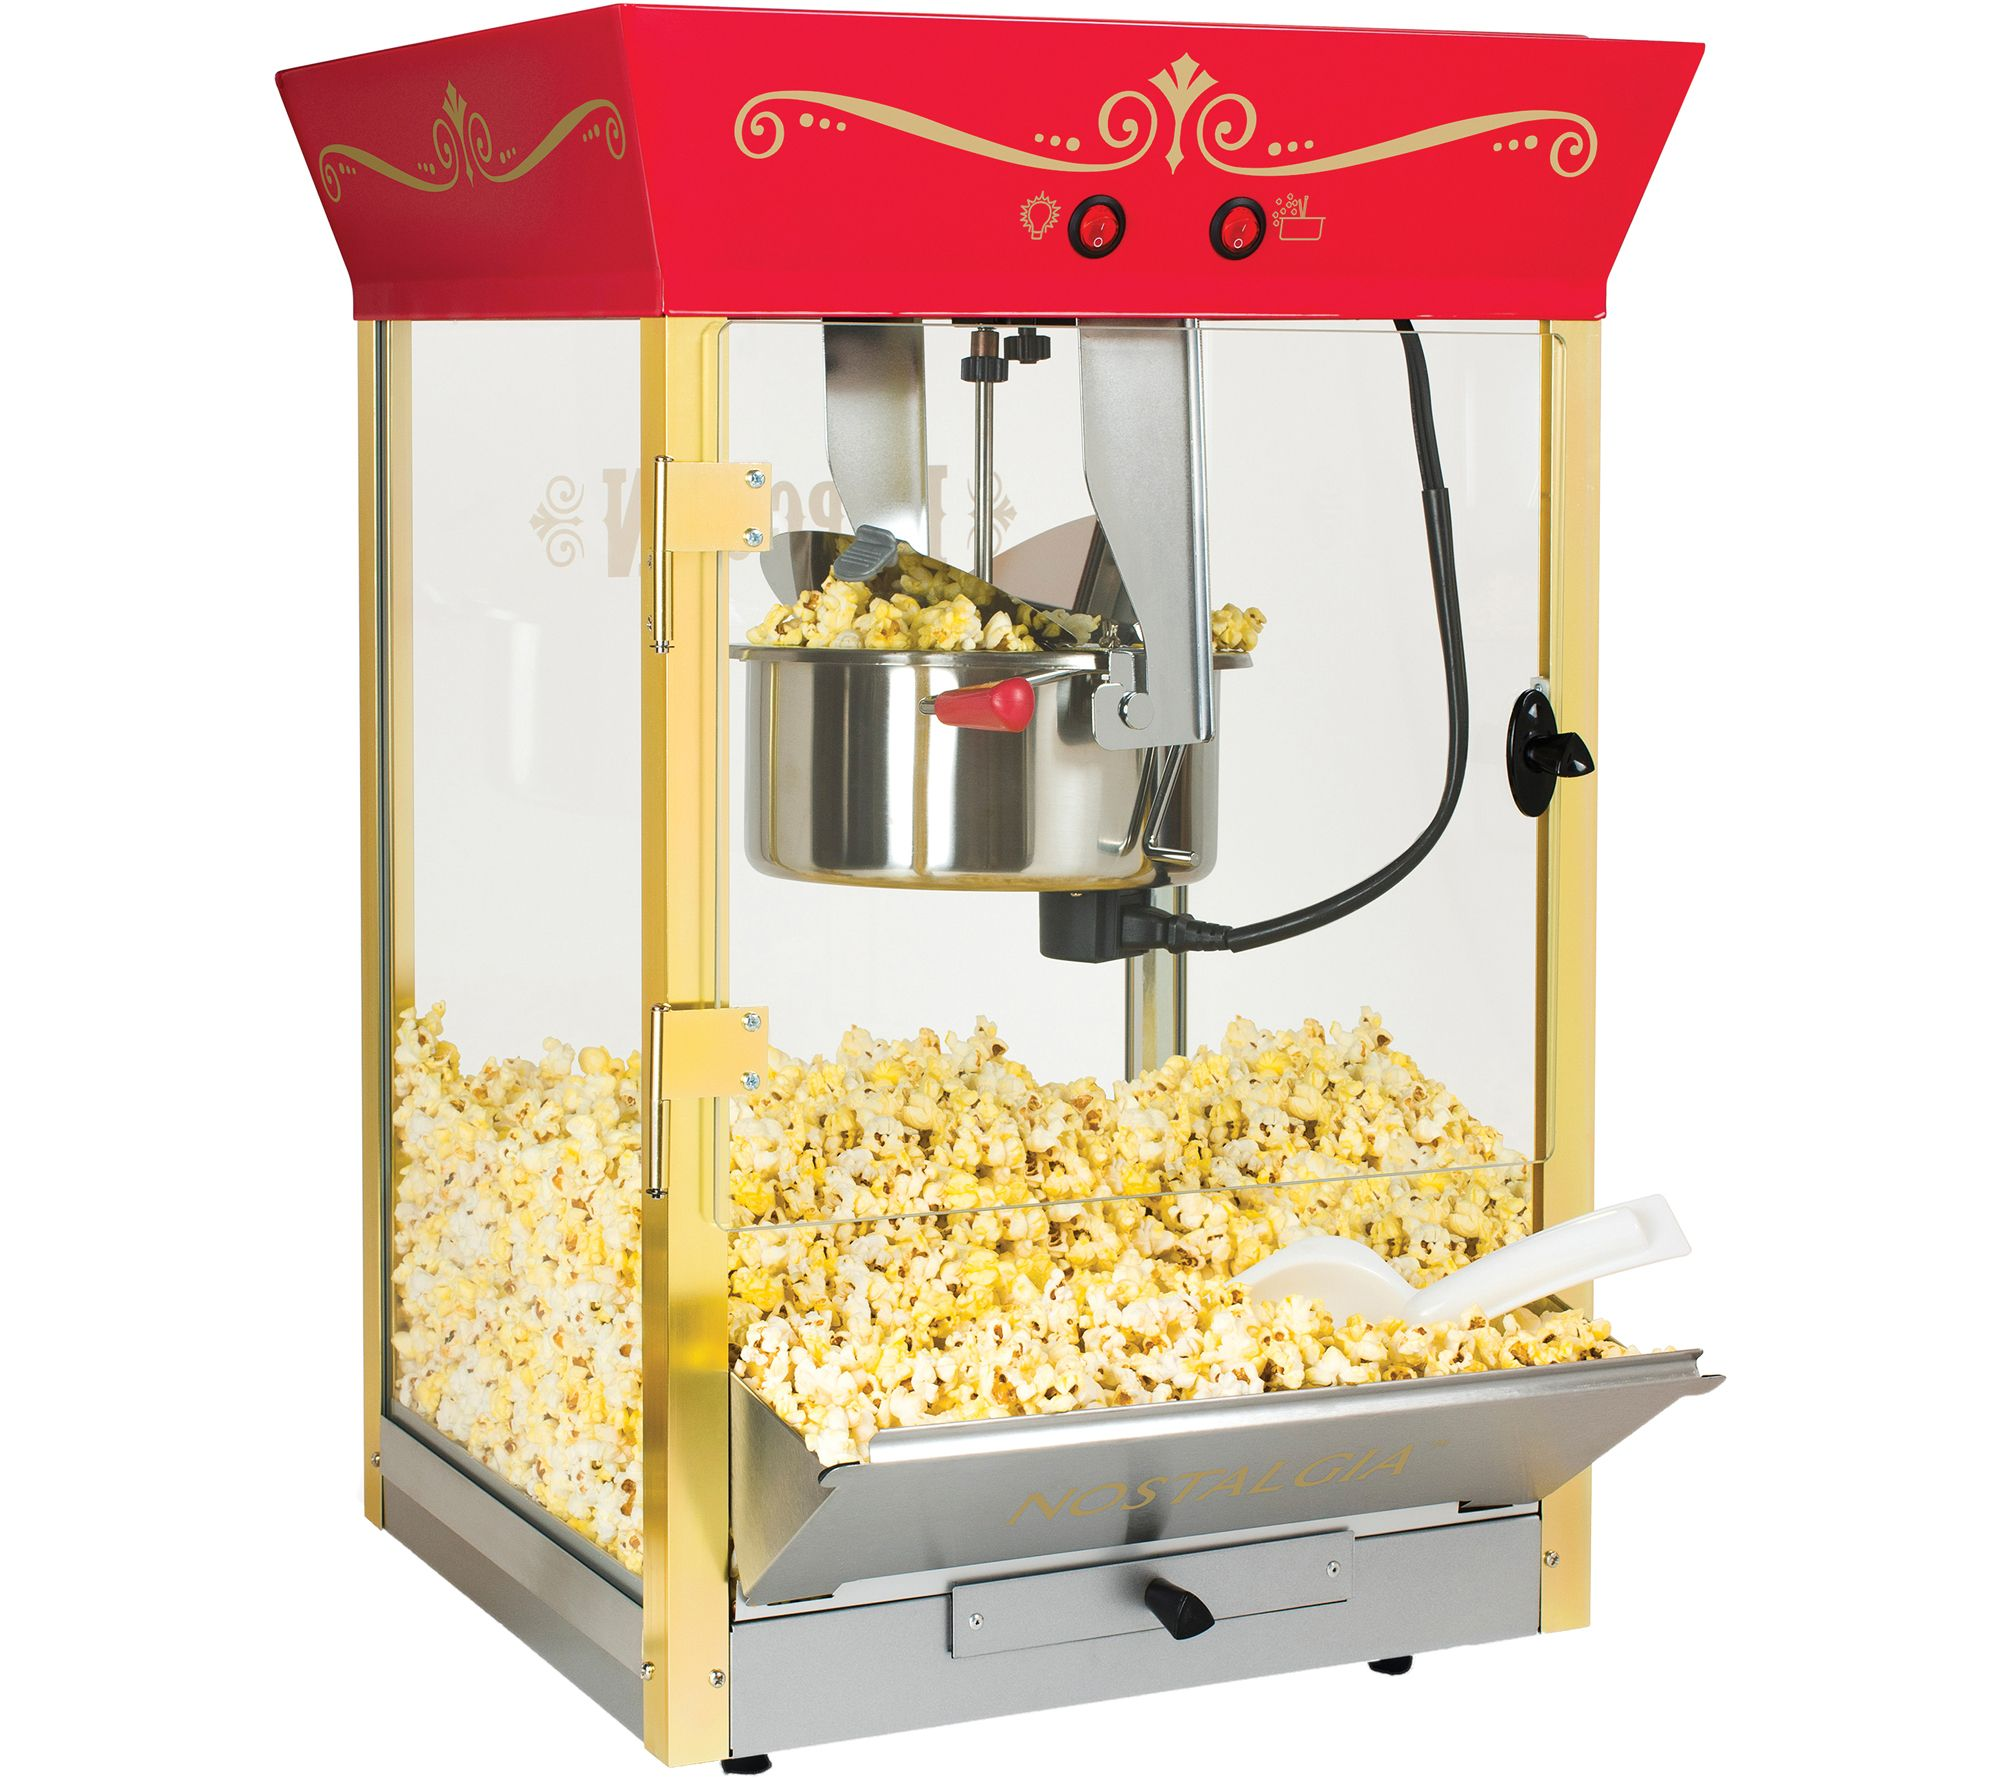 Nostalgia Electrics Commercial 8 Oz Tabletop Popcorn Popper U2014 QVC.com